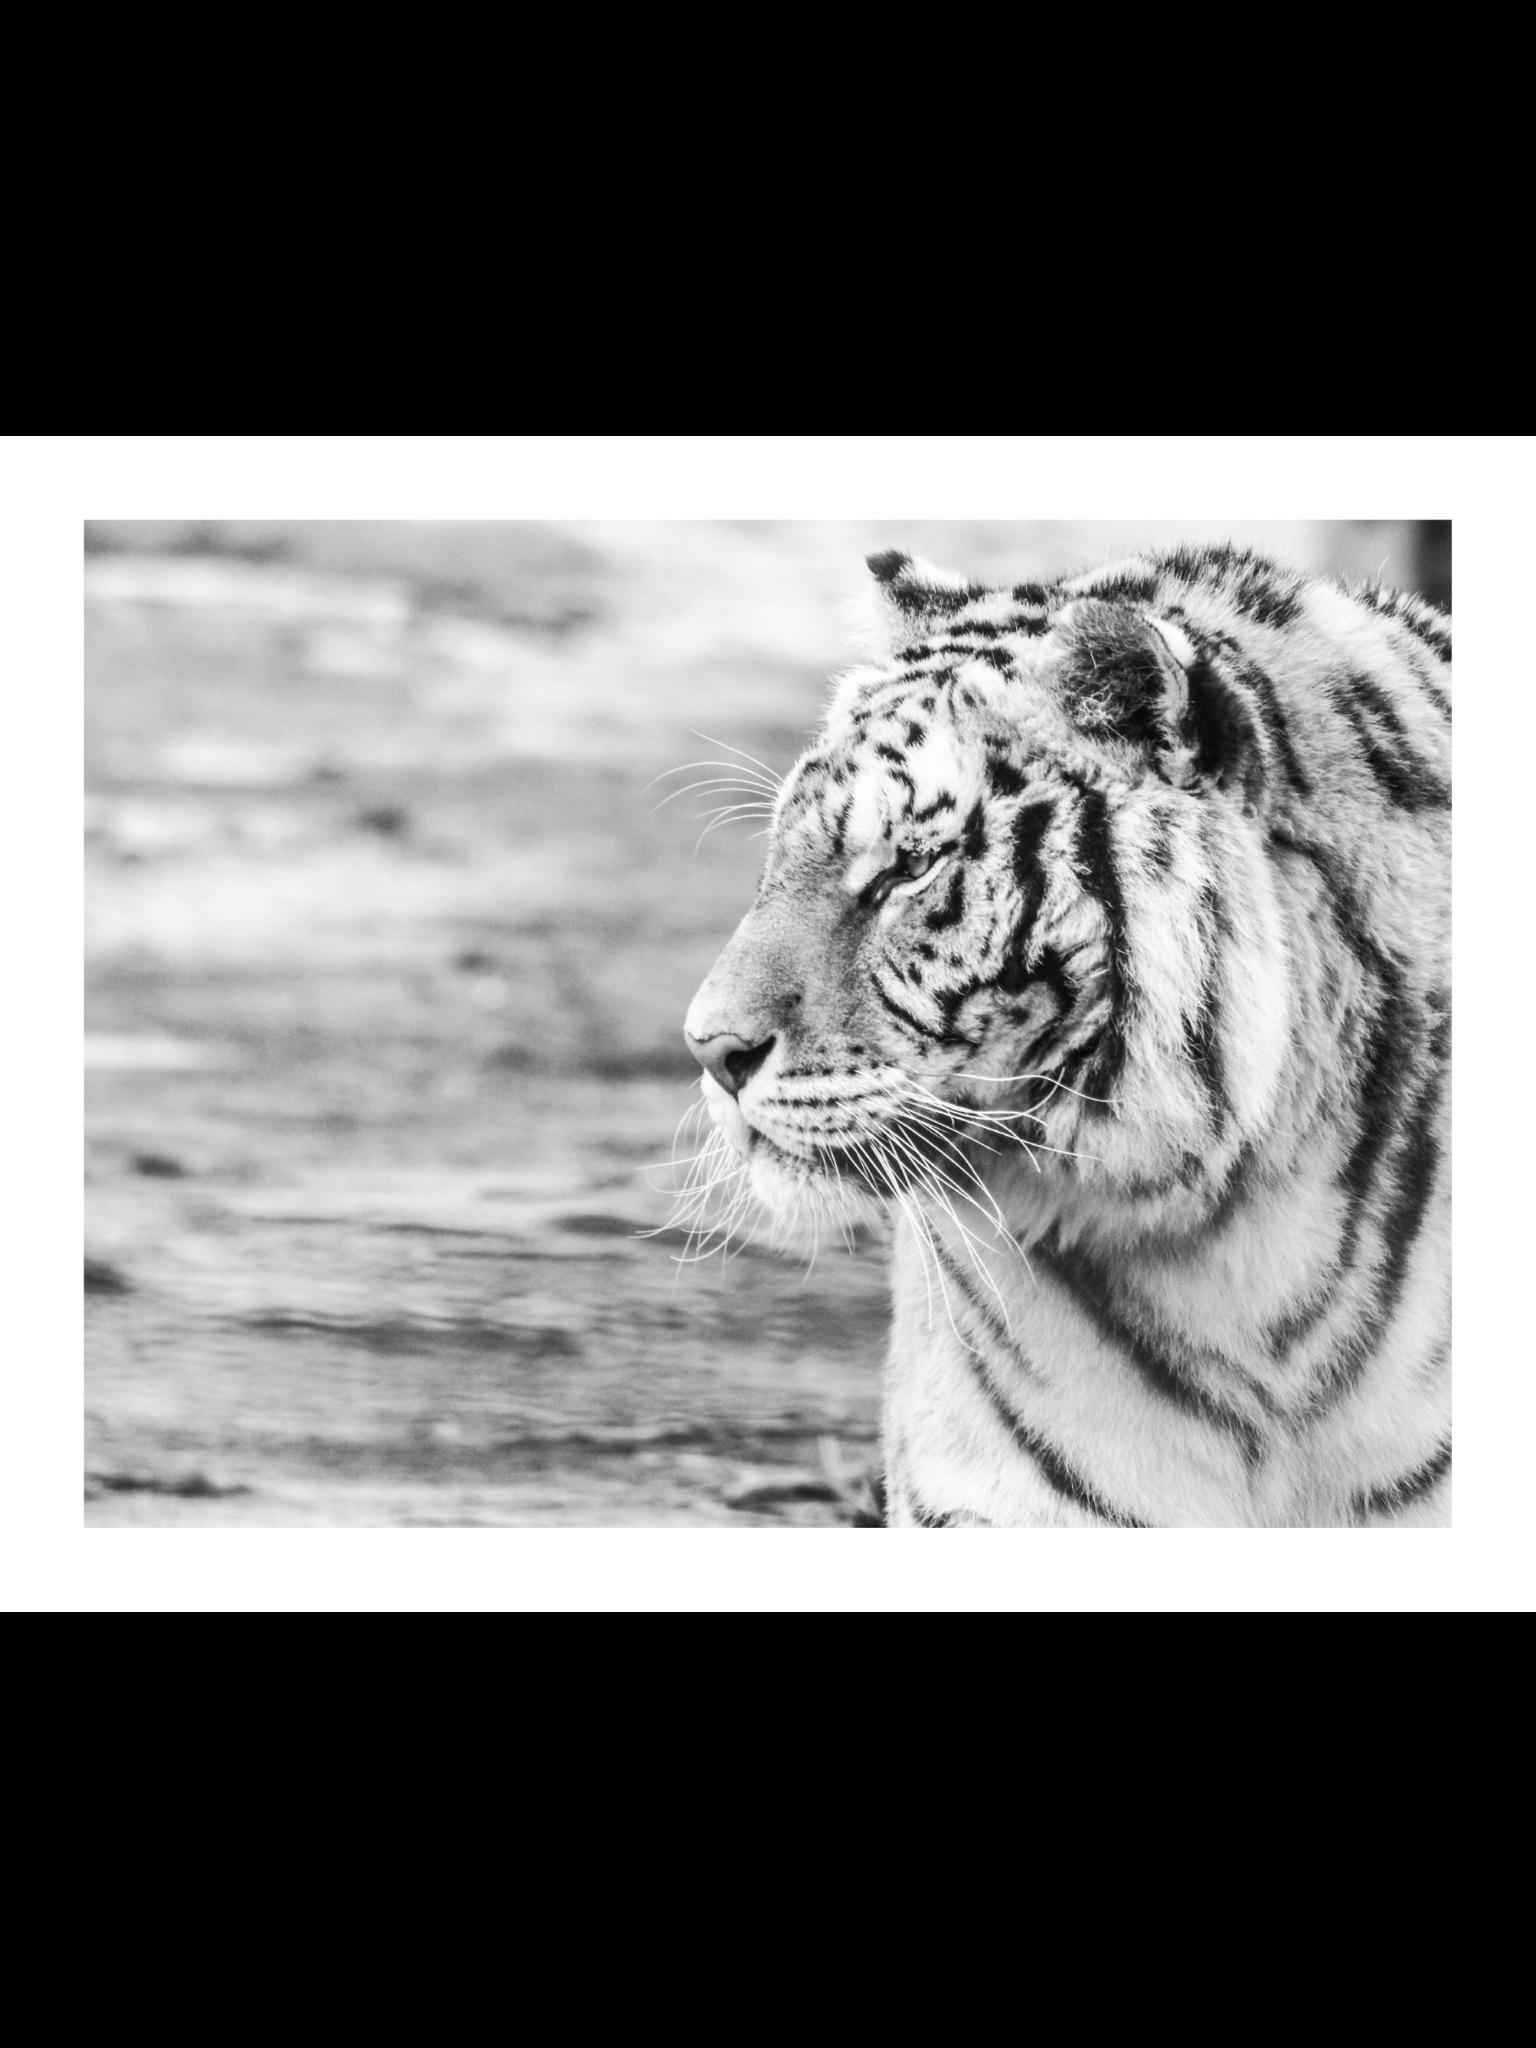 Tiger by Atrayoux